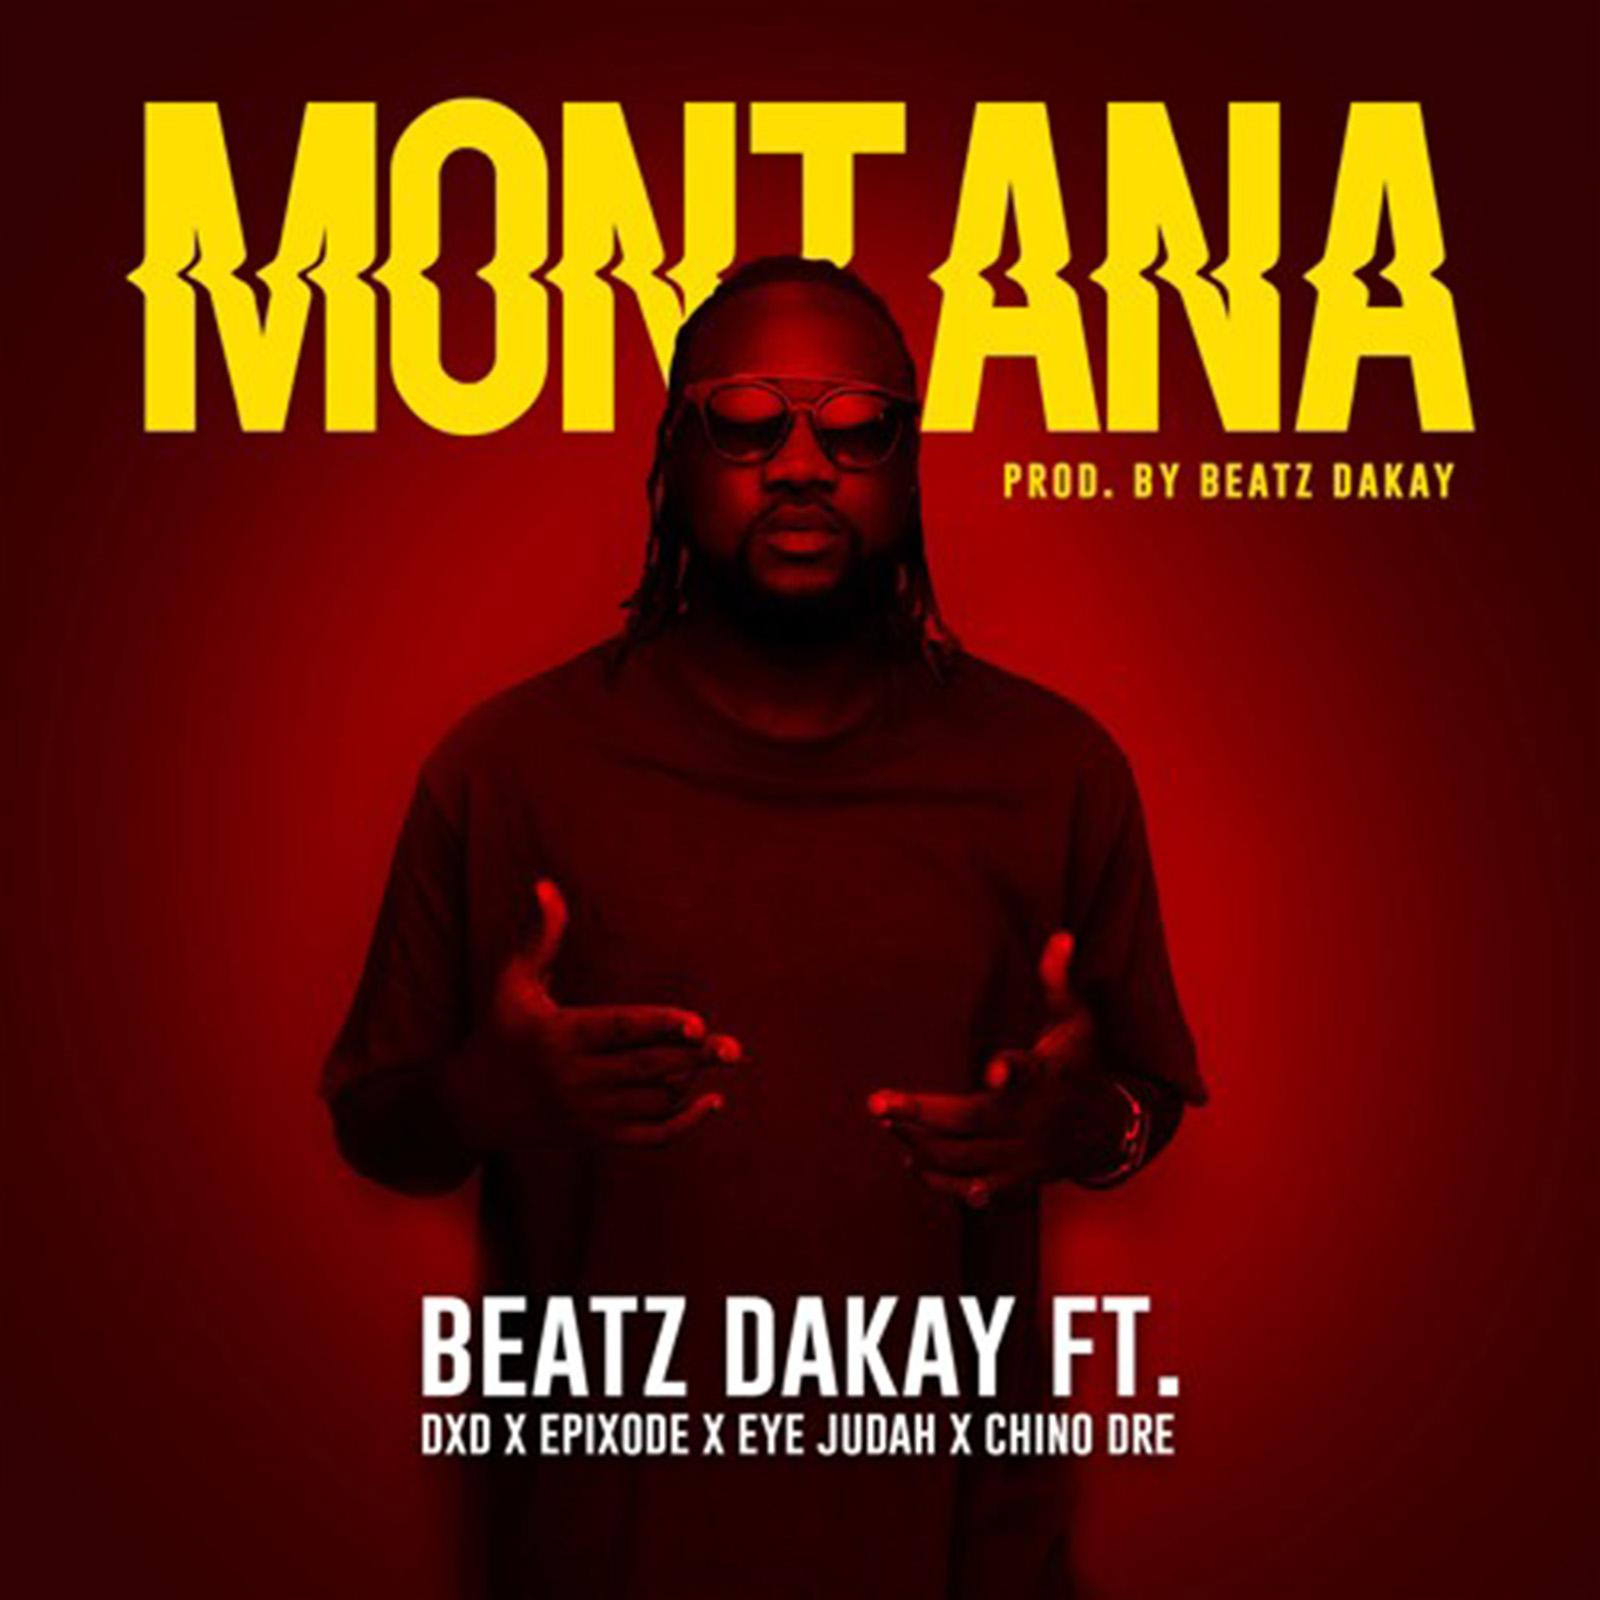 Montana by Beatz Dakay feat. DXD, Chino, Epixode & Eye Judah